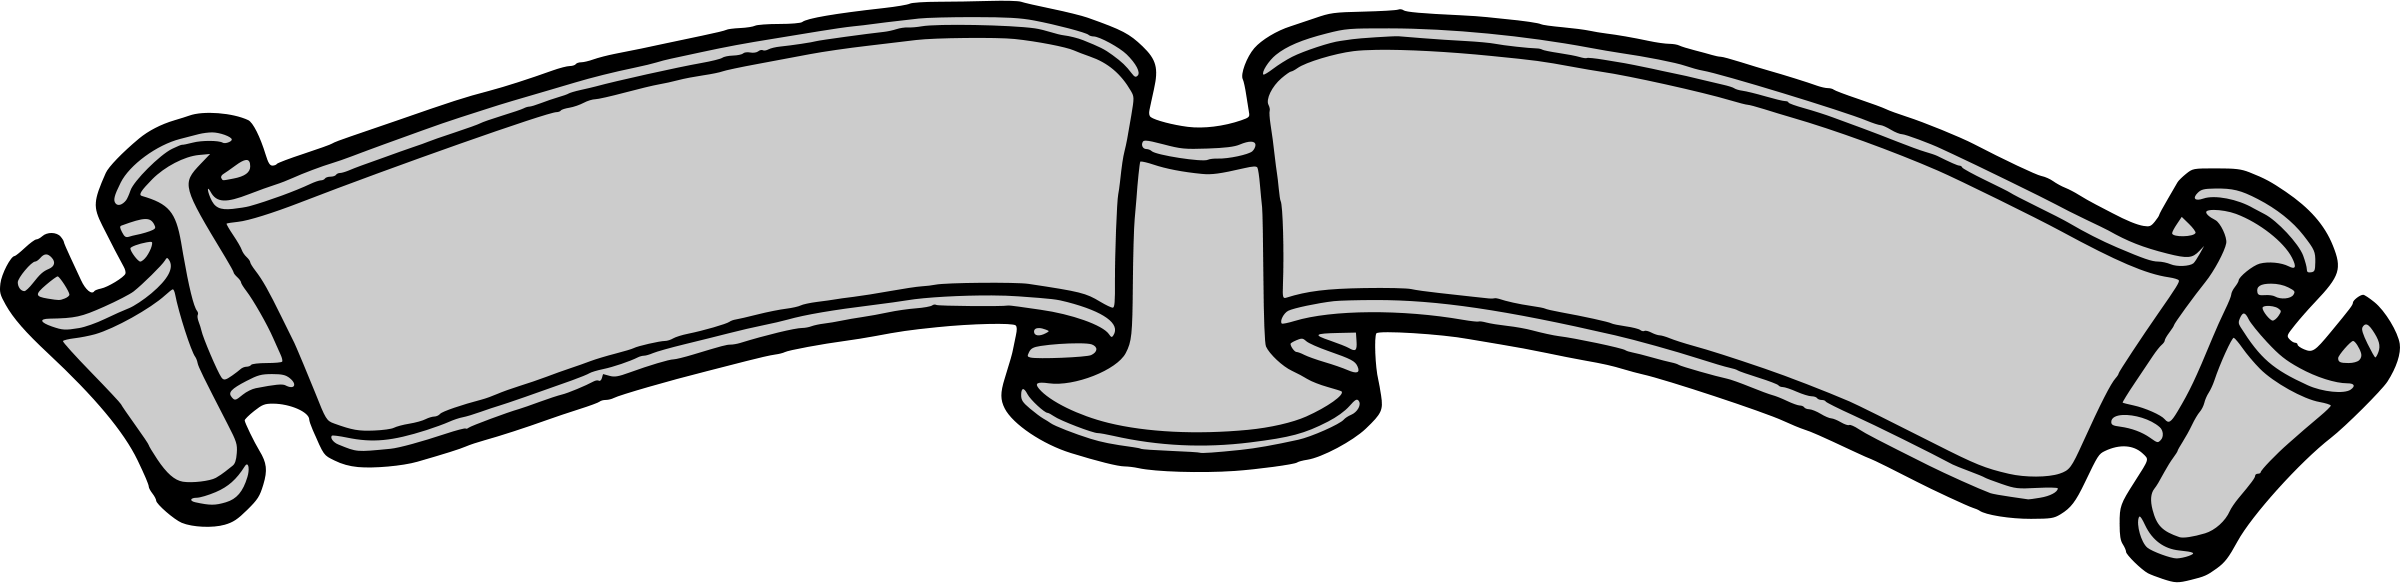 svg download Scroll banner bold clip. Western design clipart